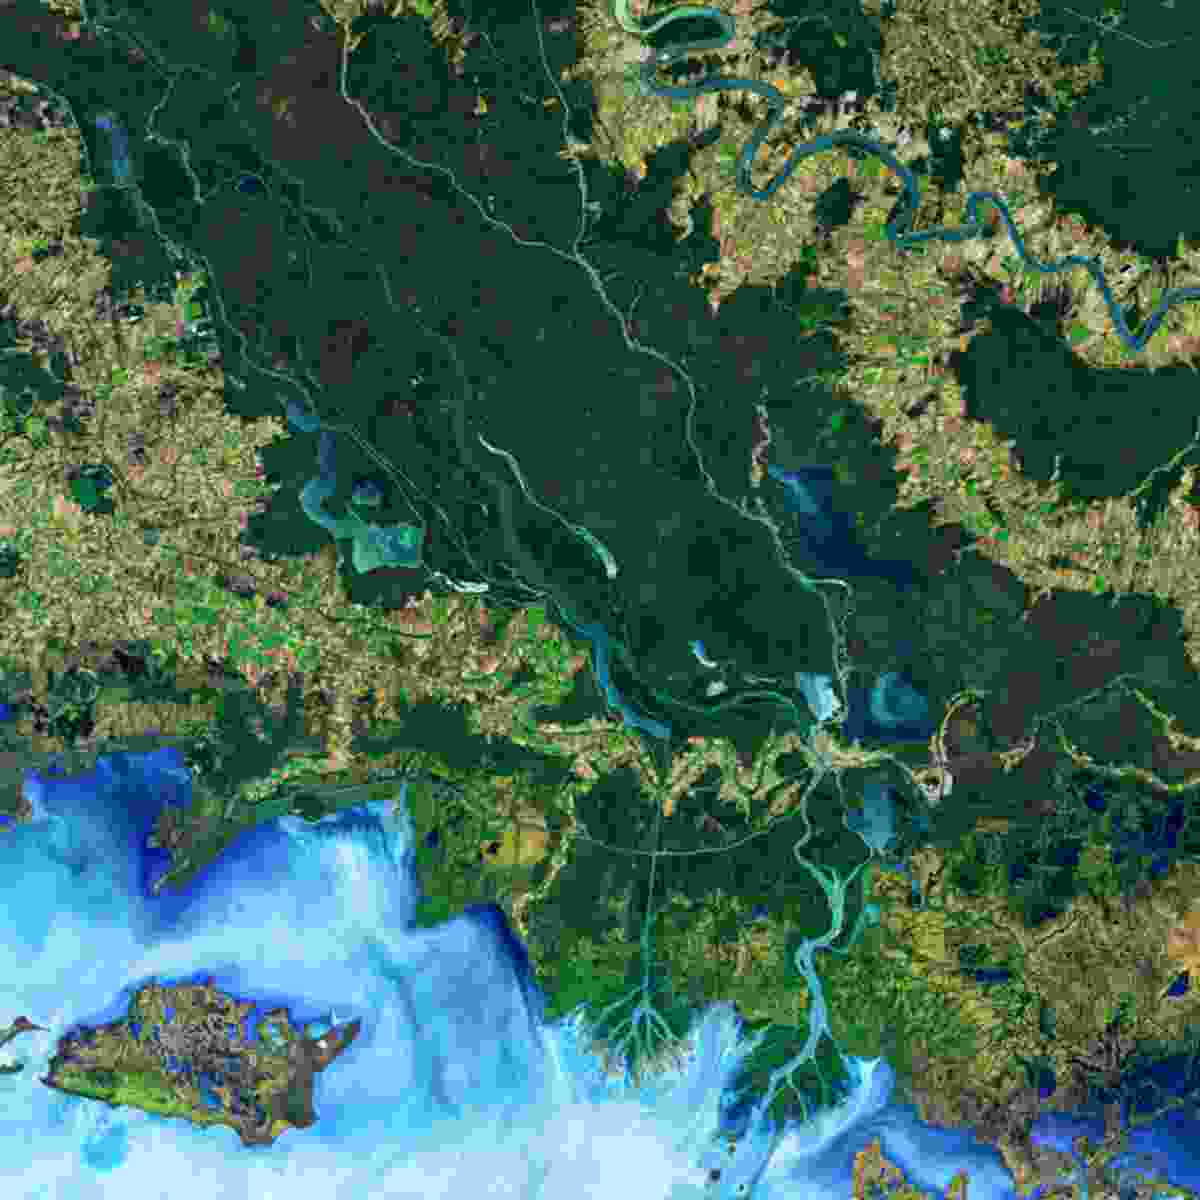 Mississippi River, USA (NASA Goddard Space Flight Centre and U.S. Geological Survey)